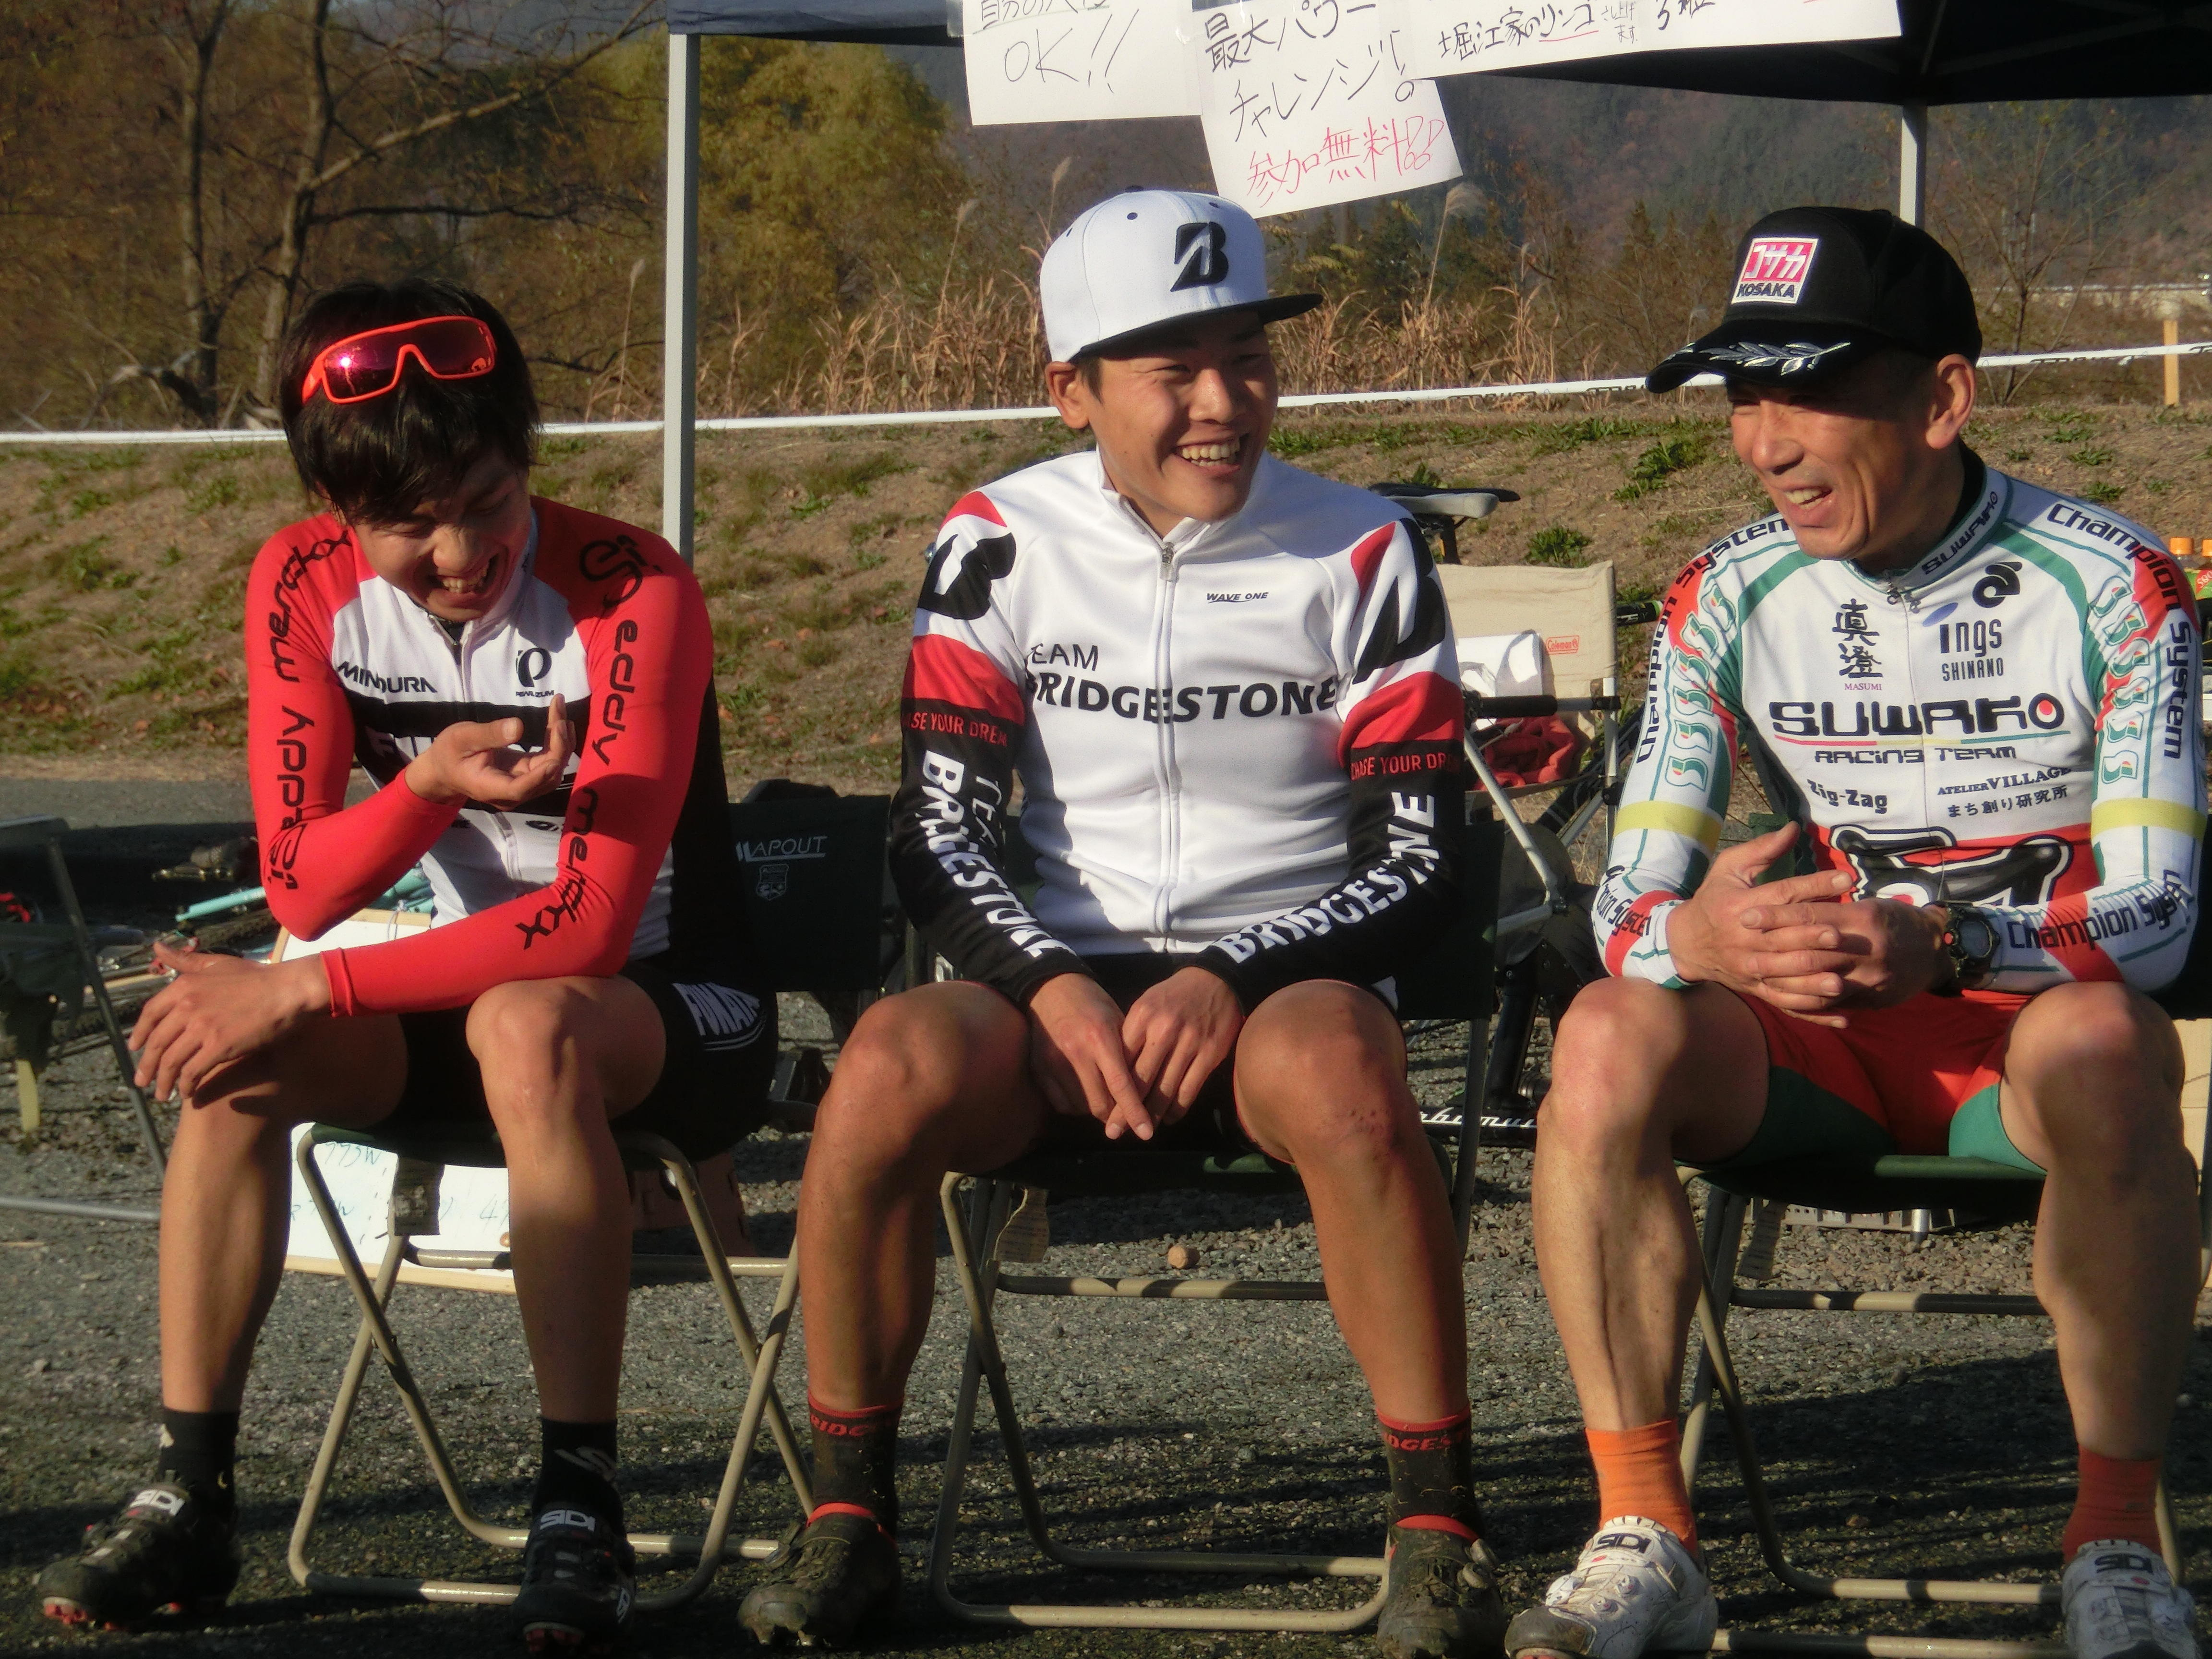 https://www.cyclocross.jp/news/380aee6e5e733262efa22edf3b25d0b224ed82e1.JPG